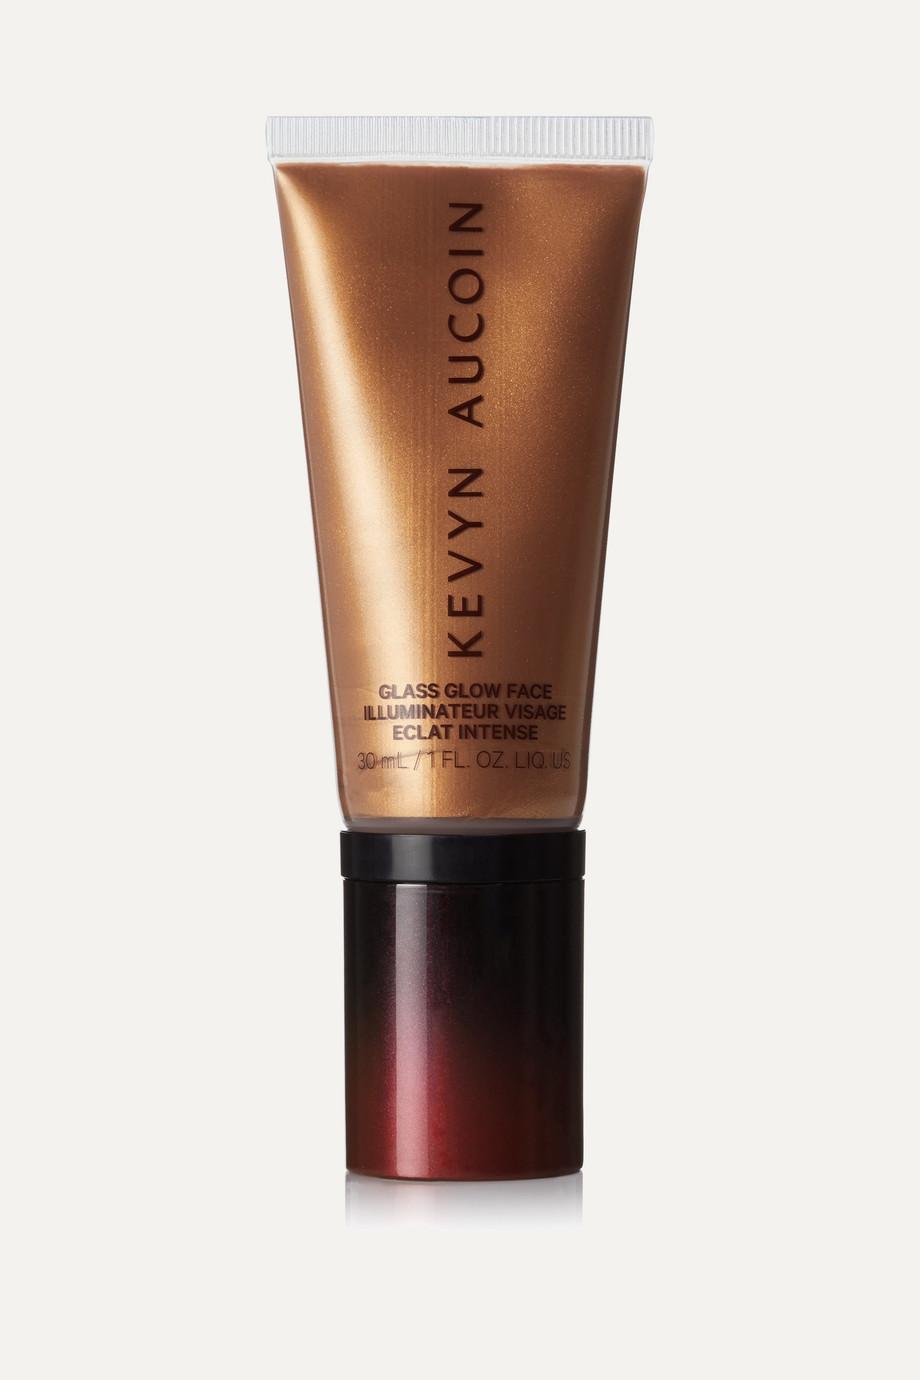 Kevyn Aucoin Illuminateur visage éclat intense, Spectrum Bronze, 30 ml